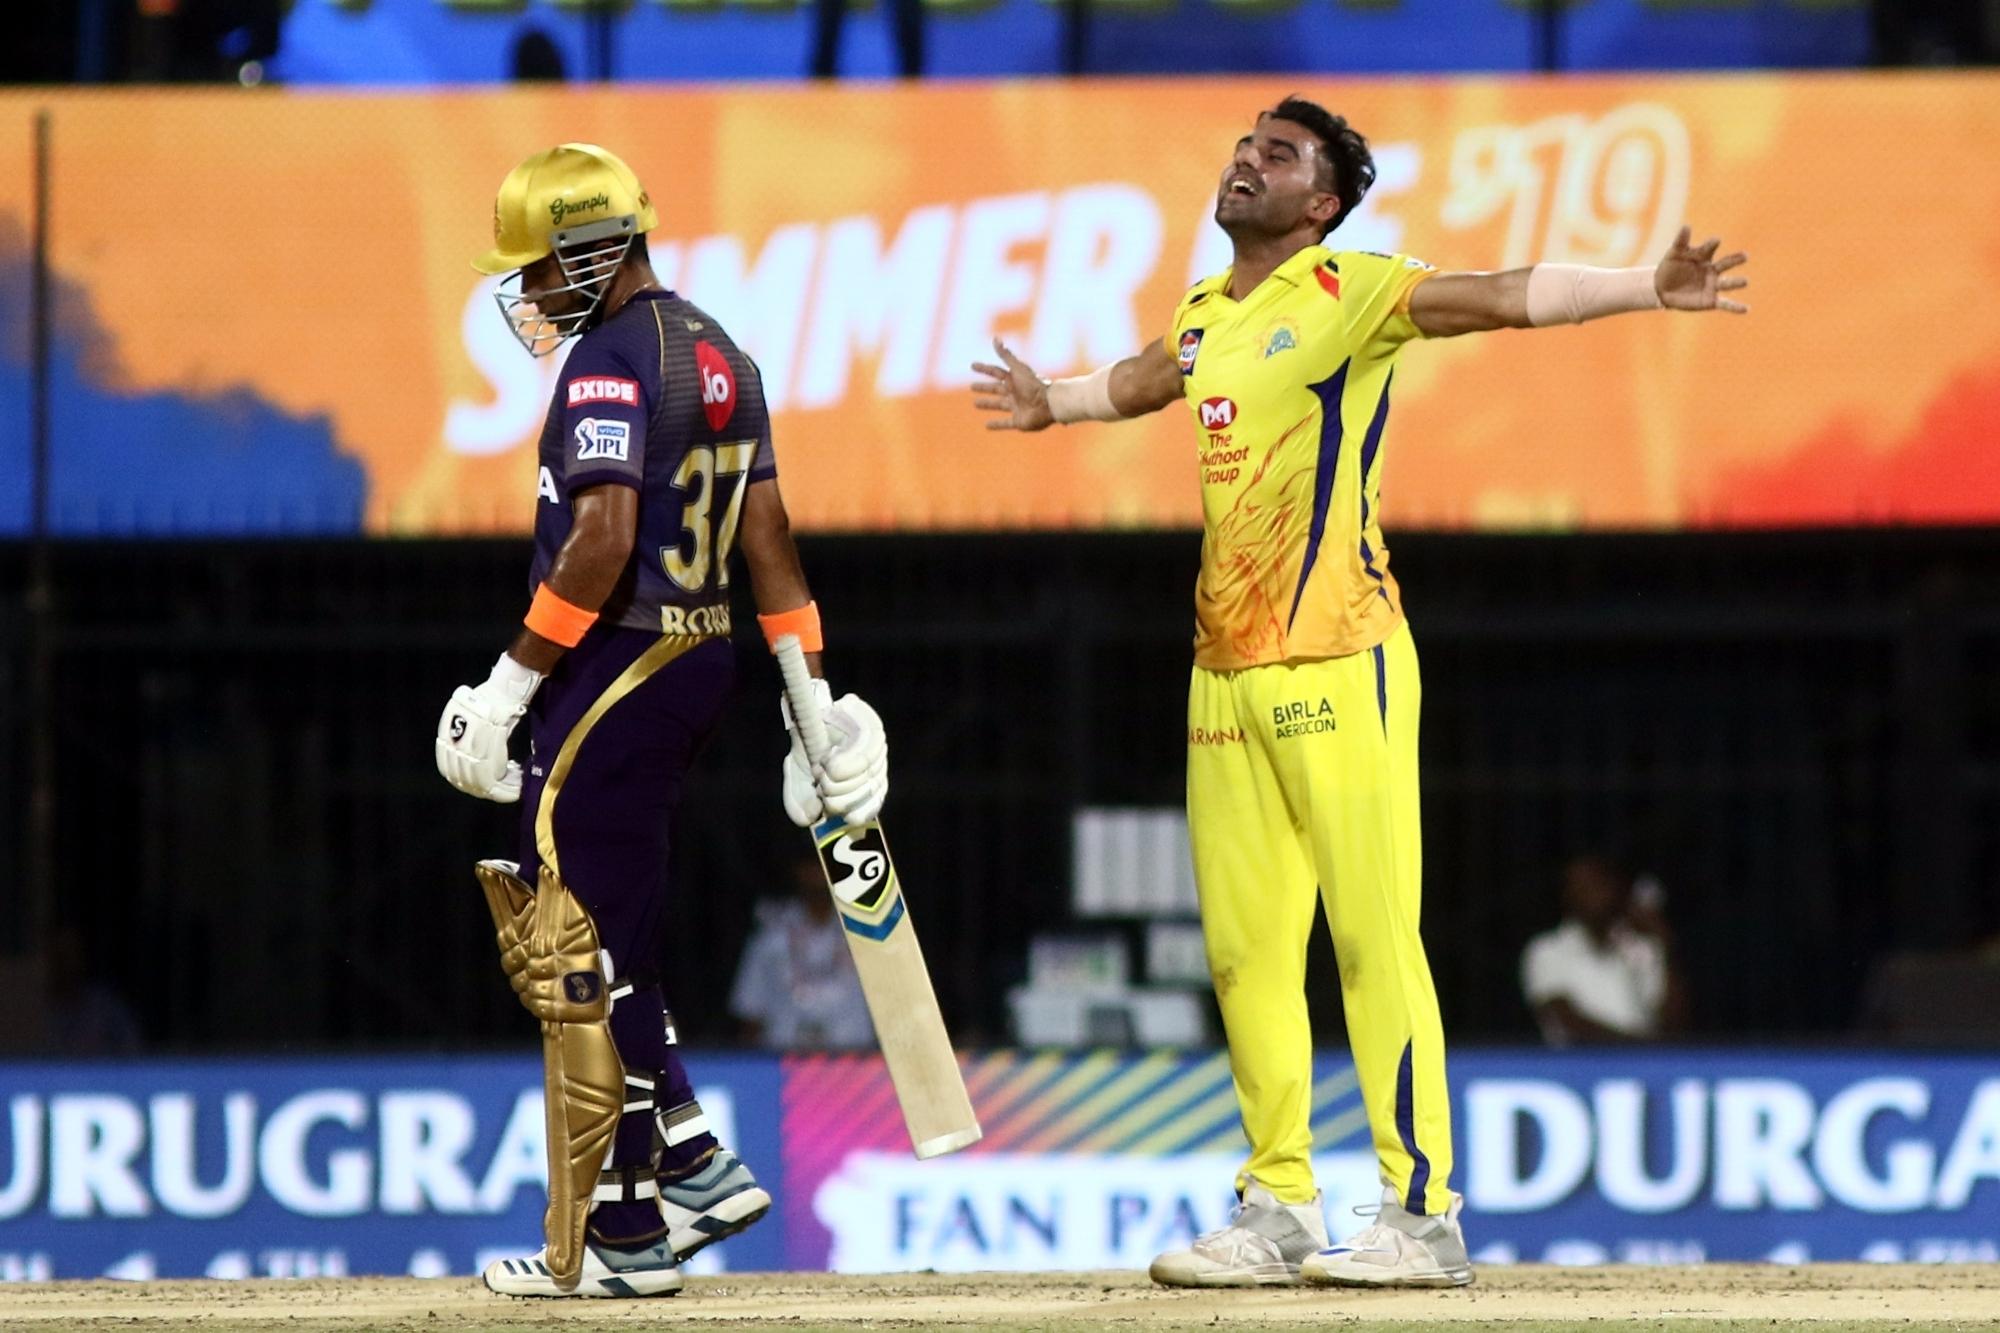 Man of the Match Deepak Chahar took 3 wickets against KKR (photo - IANS)